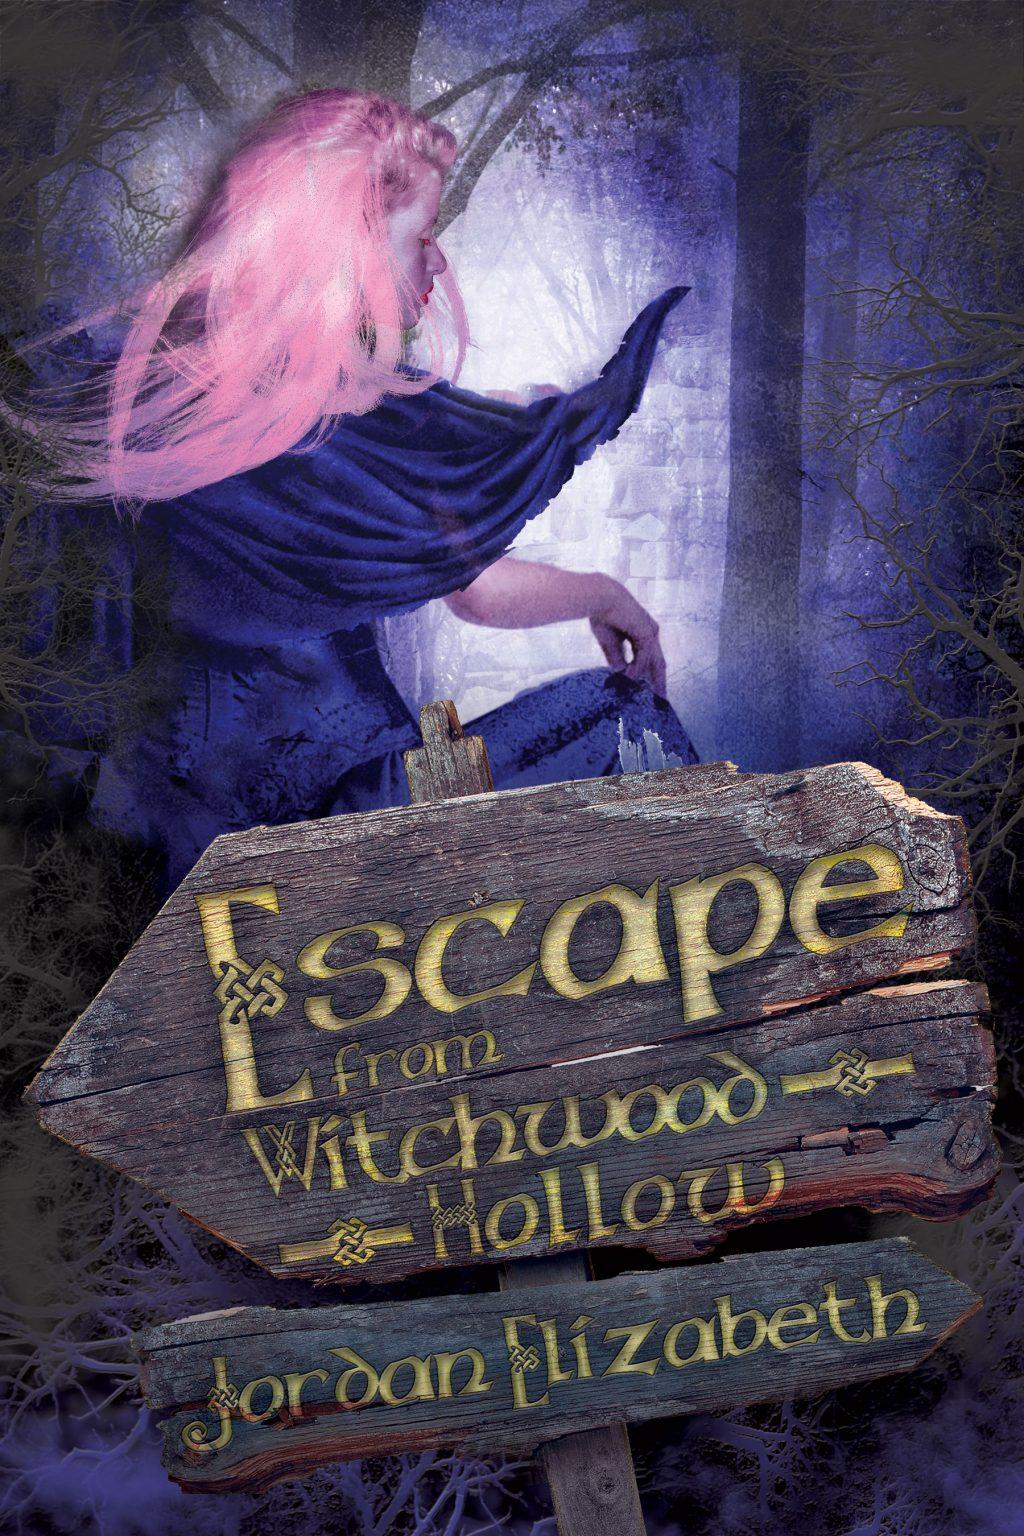 Escape from Witchwood Hollow by Jordan Elizabeth Mierek